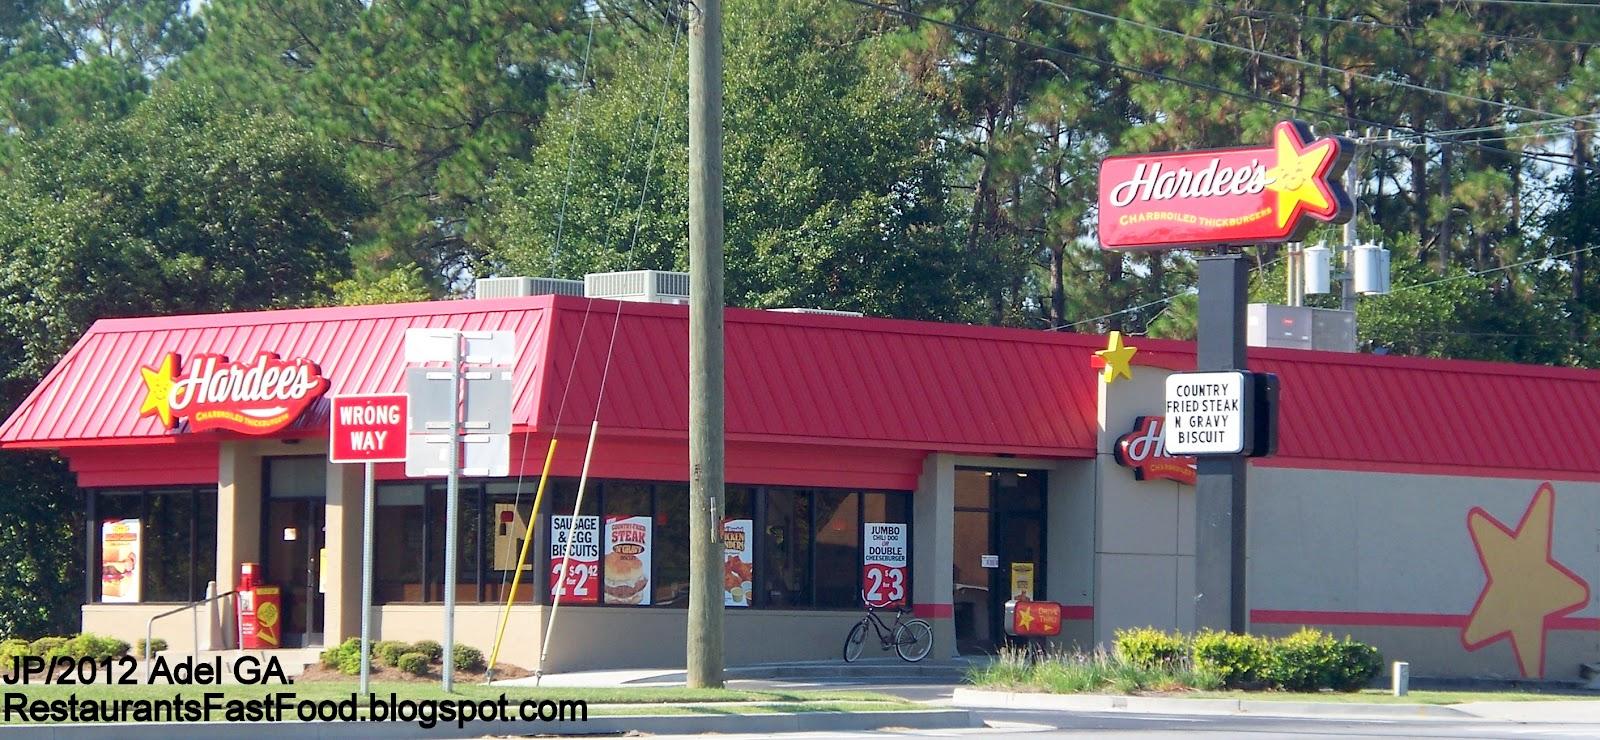 Hardee S Adel Georgia W 4th St Hamburger Fast Food Restaurant Cook County Ga